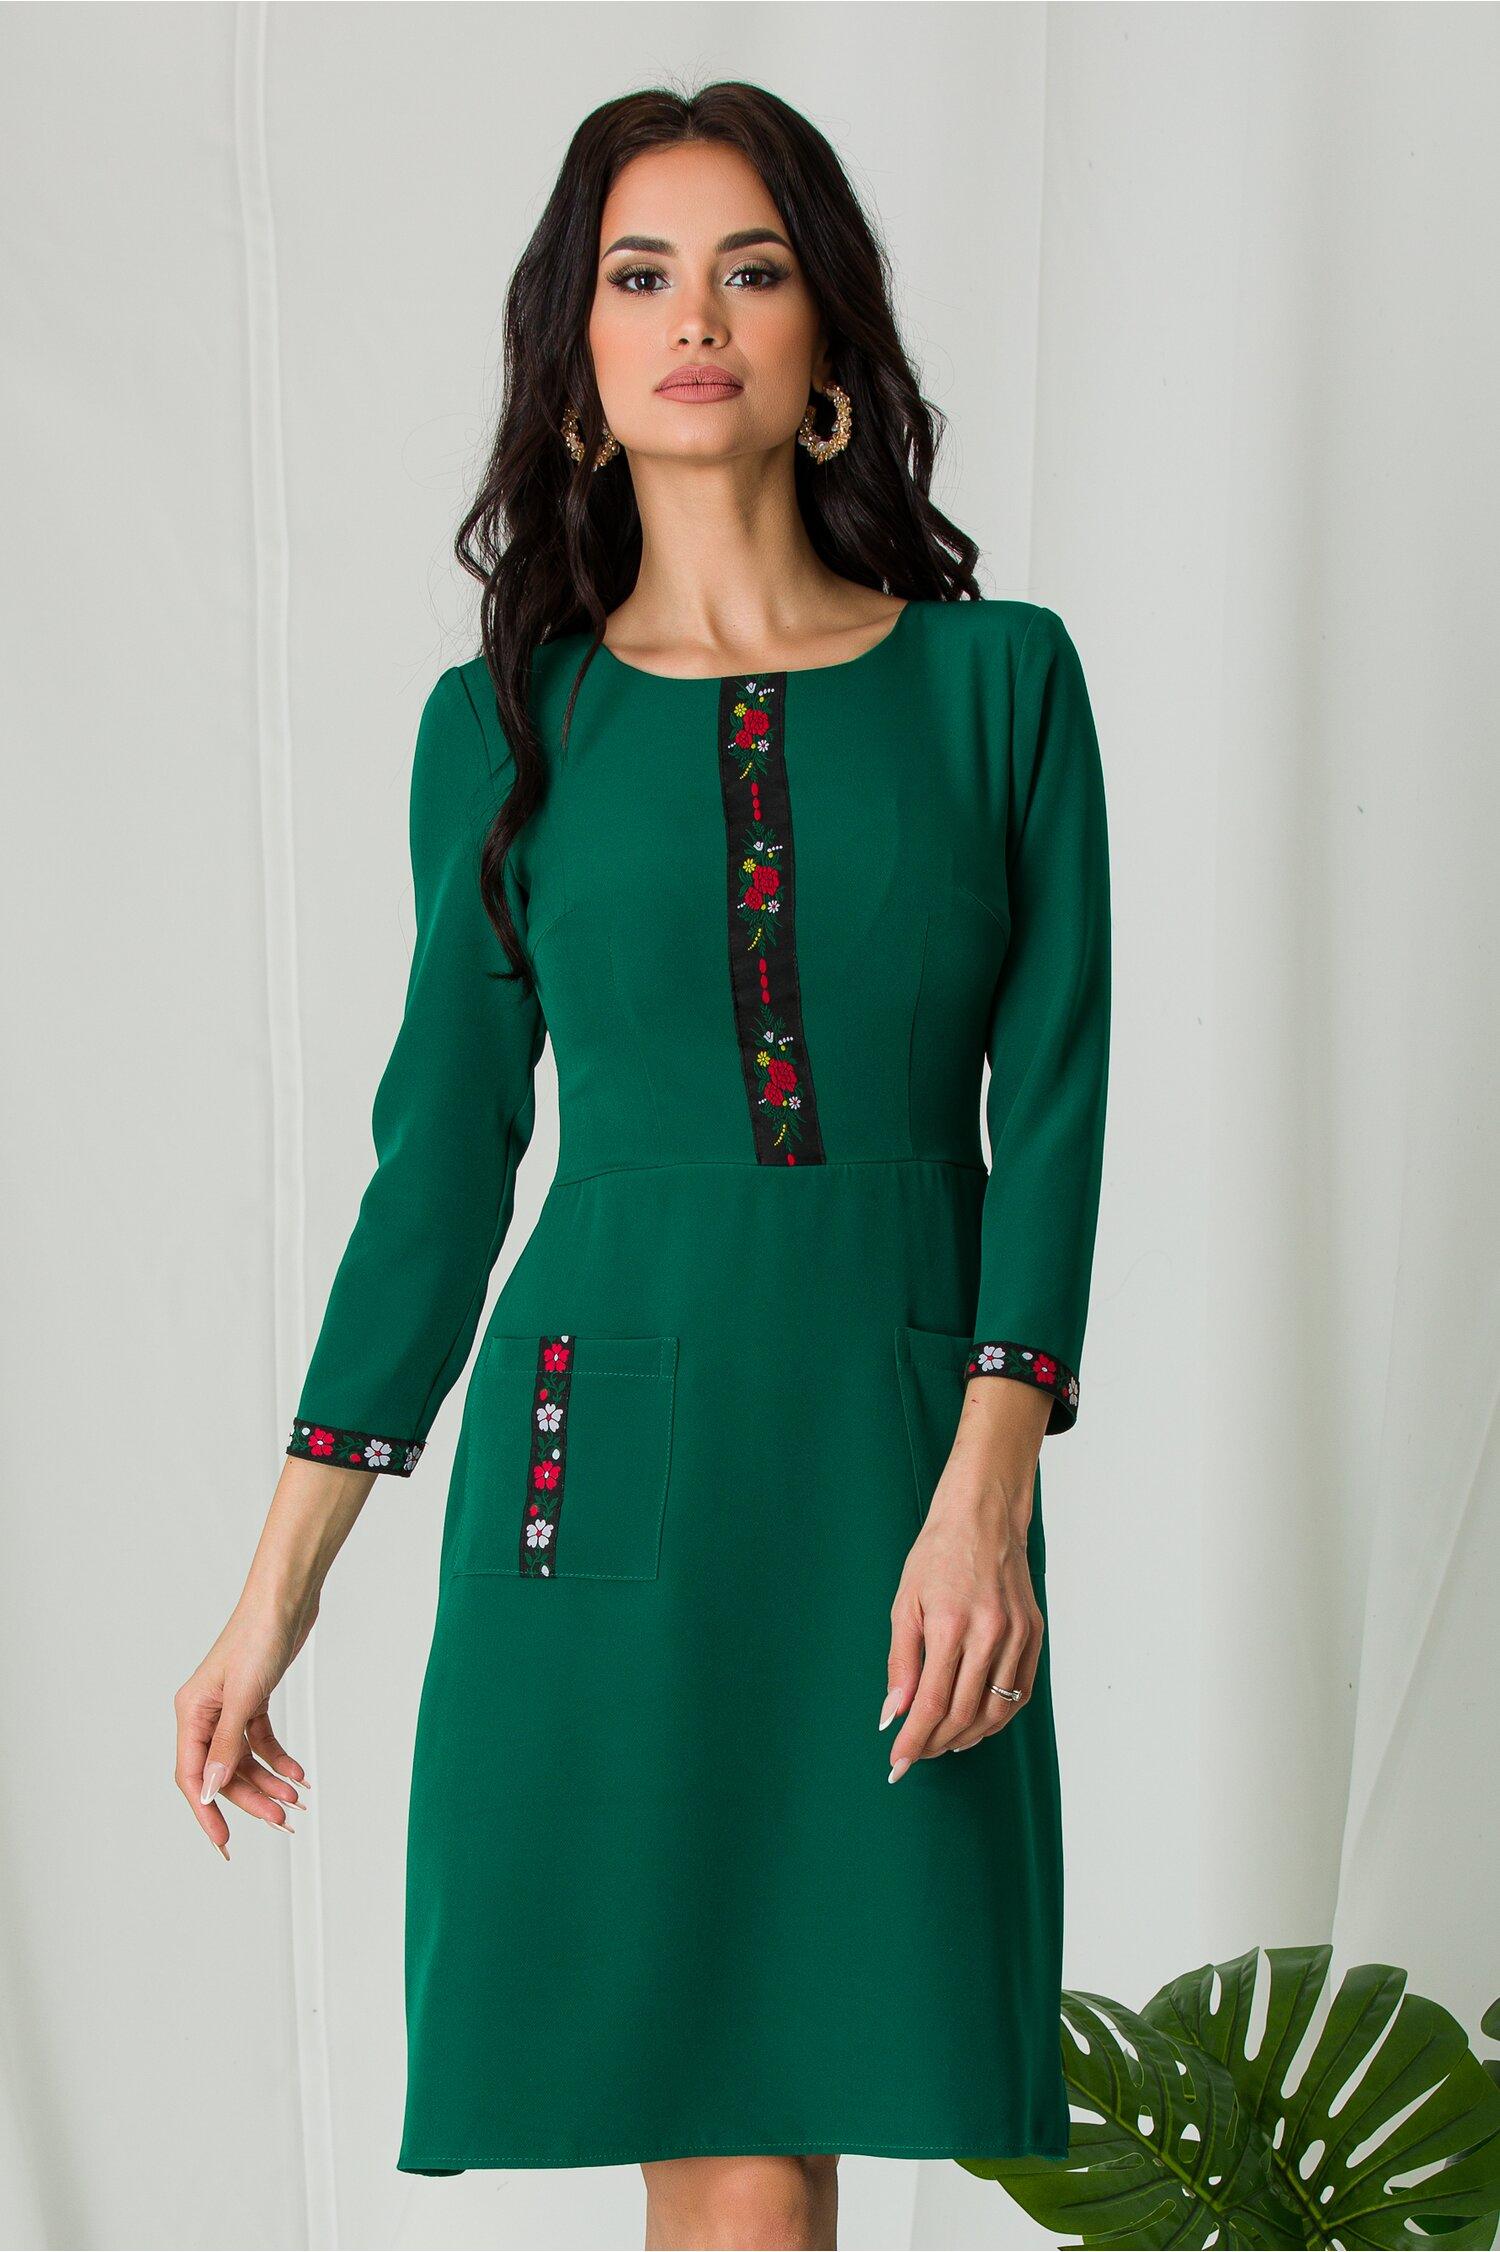 Rochie Ella Collection Ilinca verde cu benzi decorative